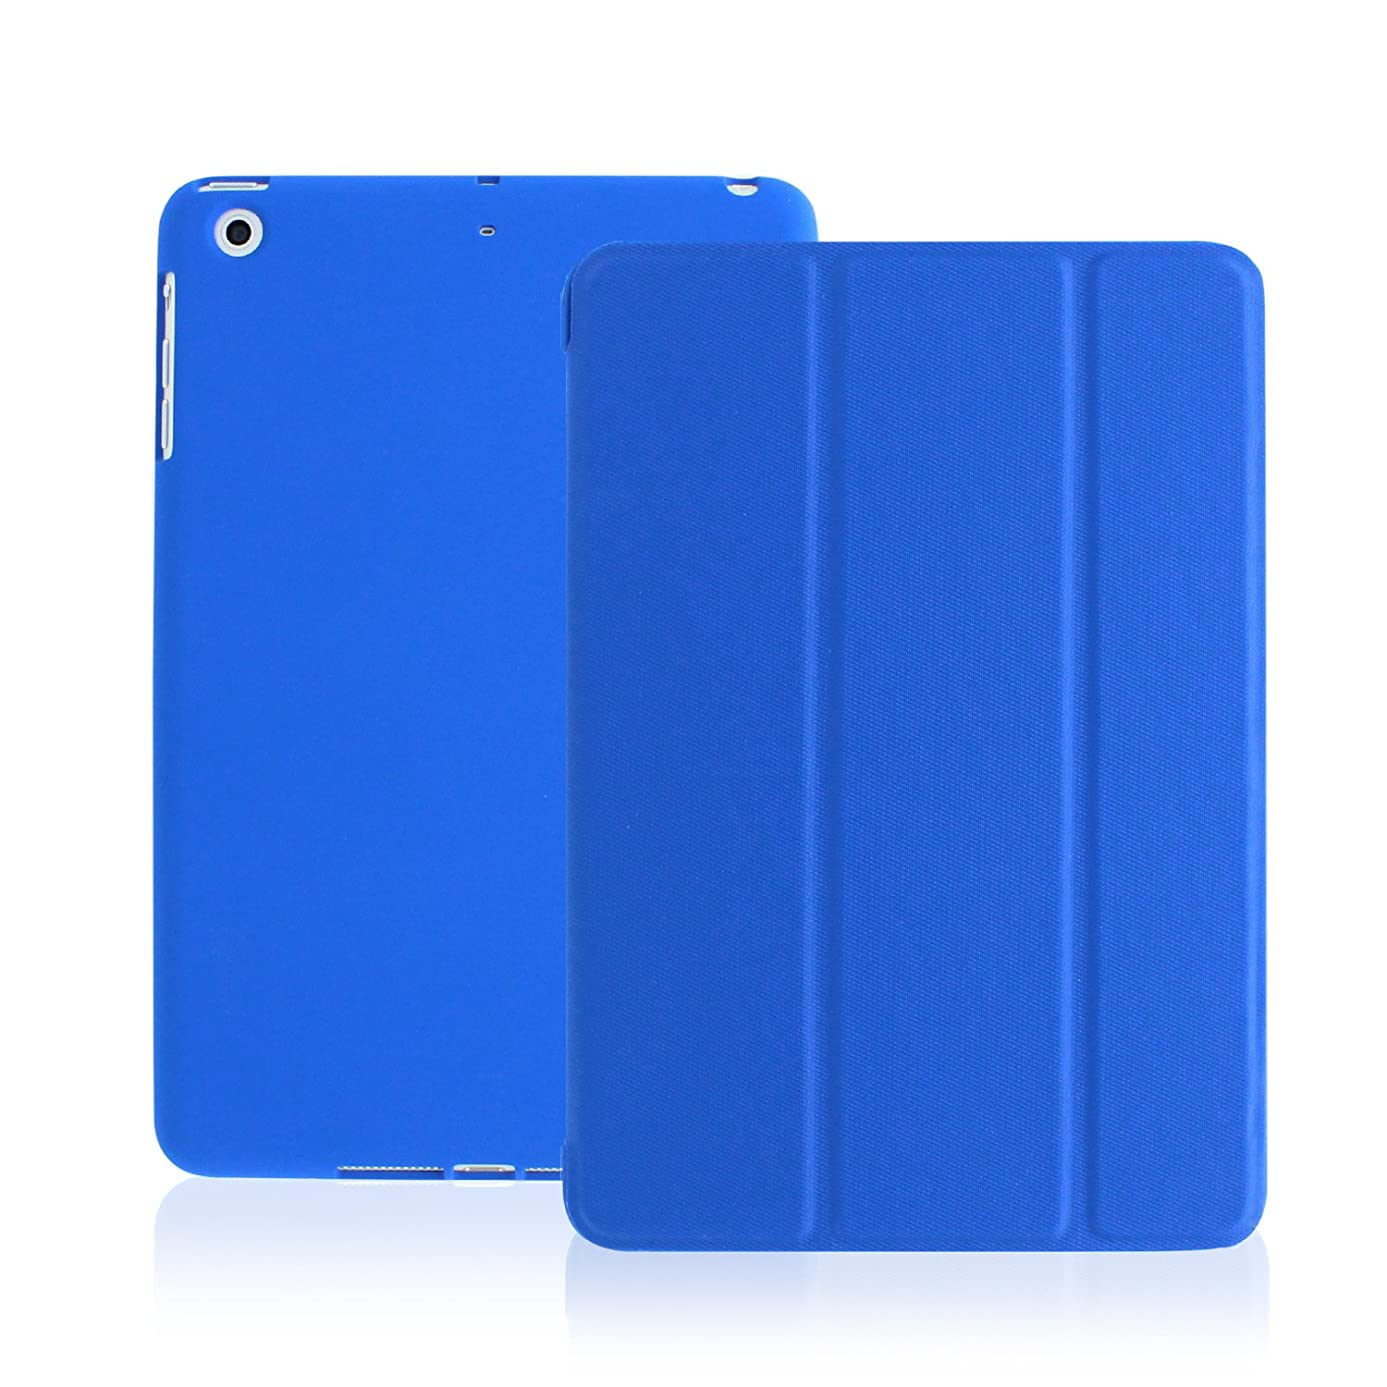 KHOMO Mini-Dual-Dark-Blue iPad Mini 1 2 3 Case - Dual Series - Ultra Slim Twill Blue Cover with Auto Sleep Wake Feature for Apple iPad Mini 1st, 2nd and 3rd Generation